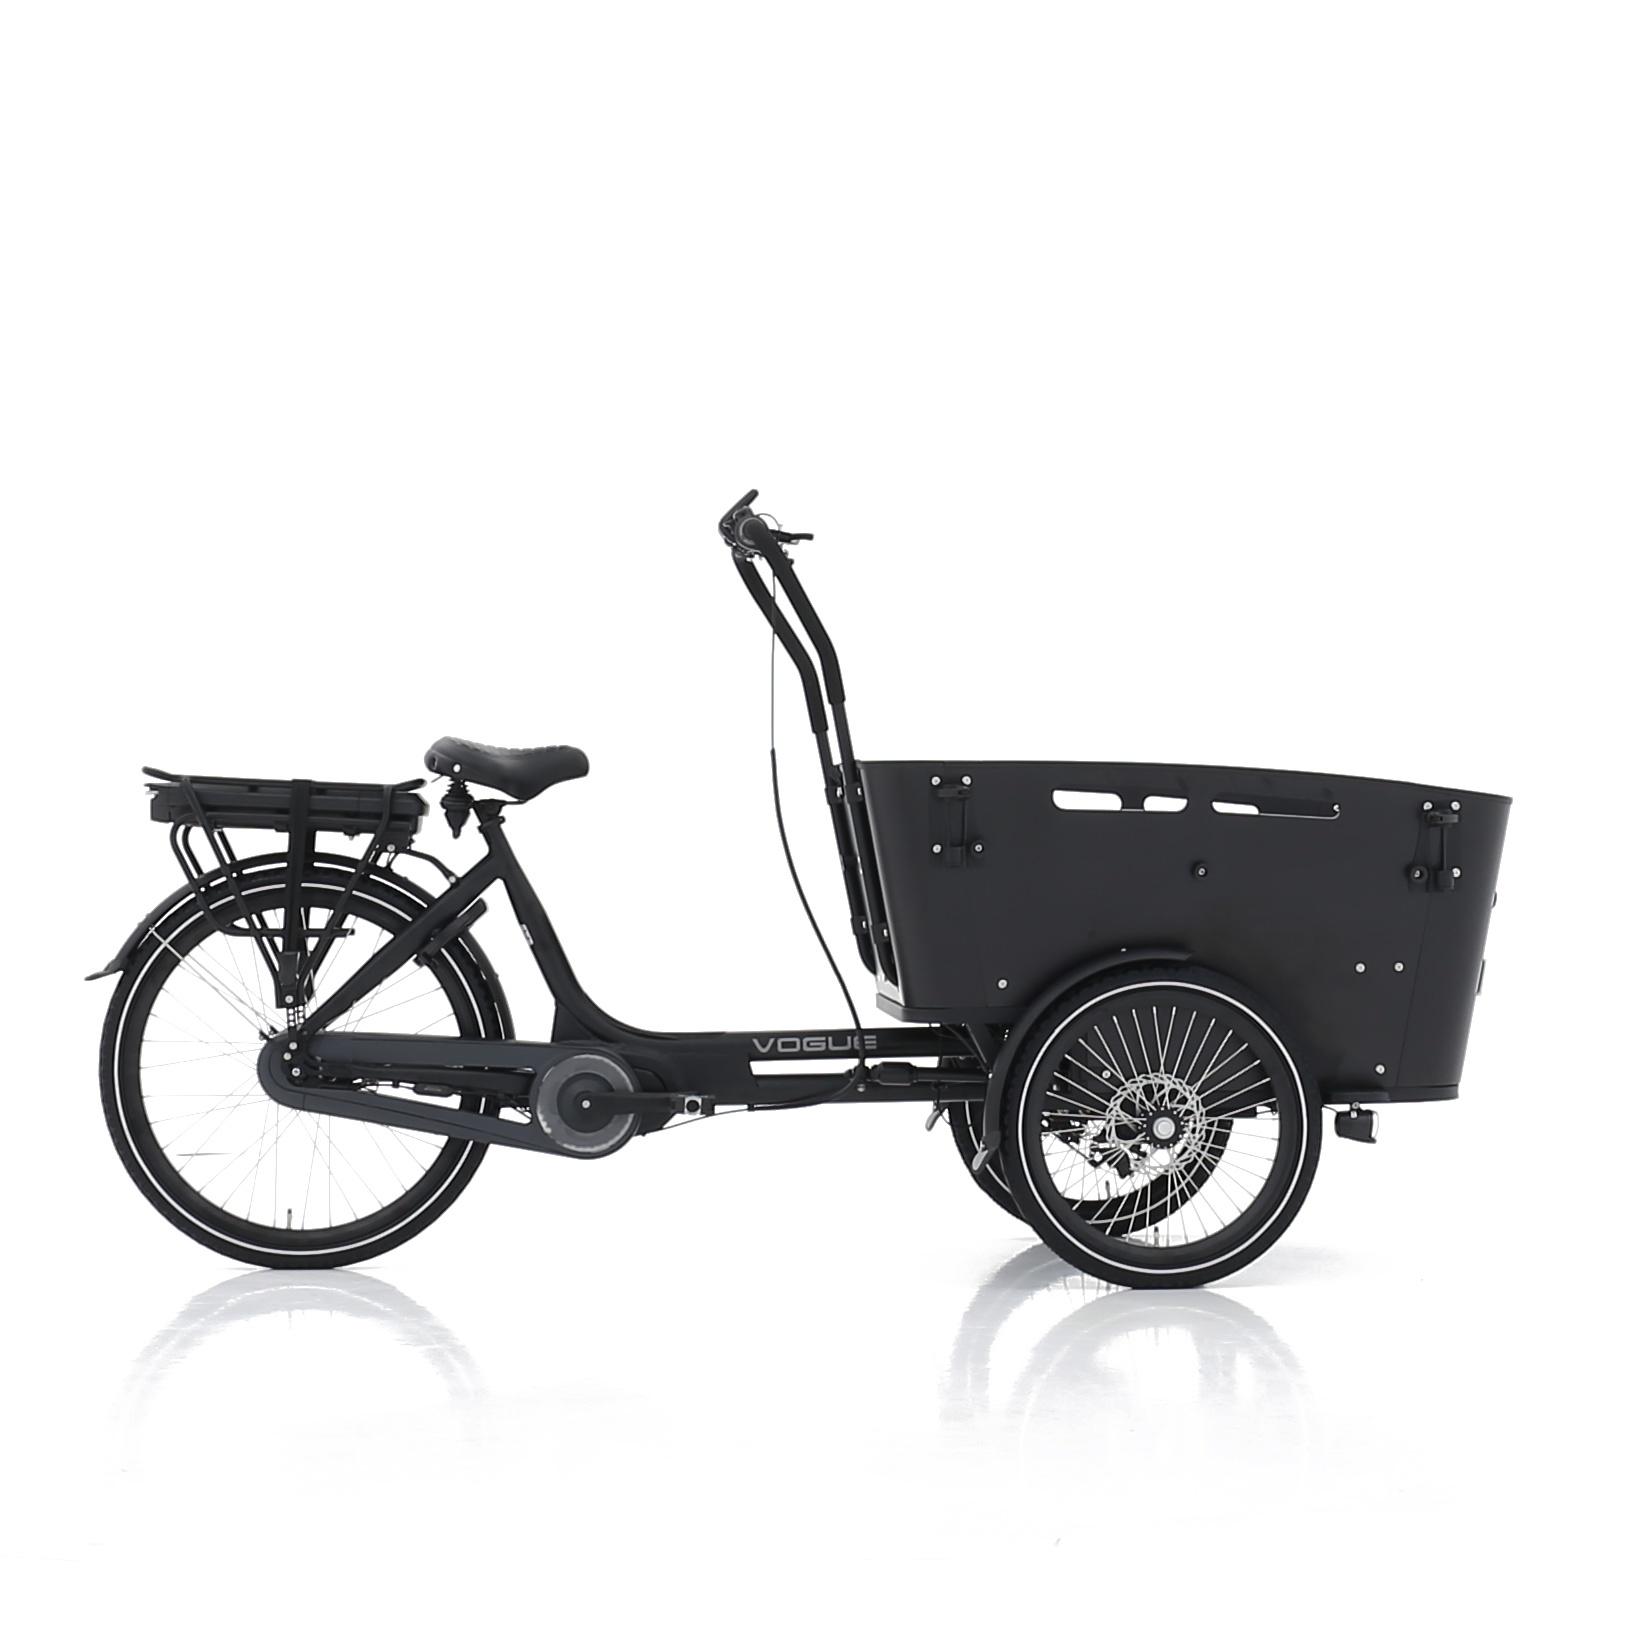 Vogue Carry 3 Bakfiets 49 cm Matt Black/Black 7V online kopen